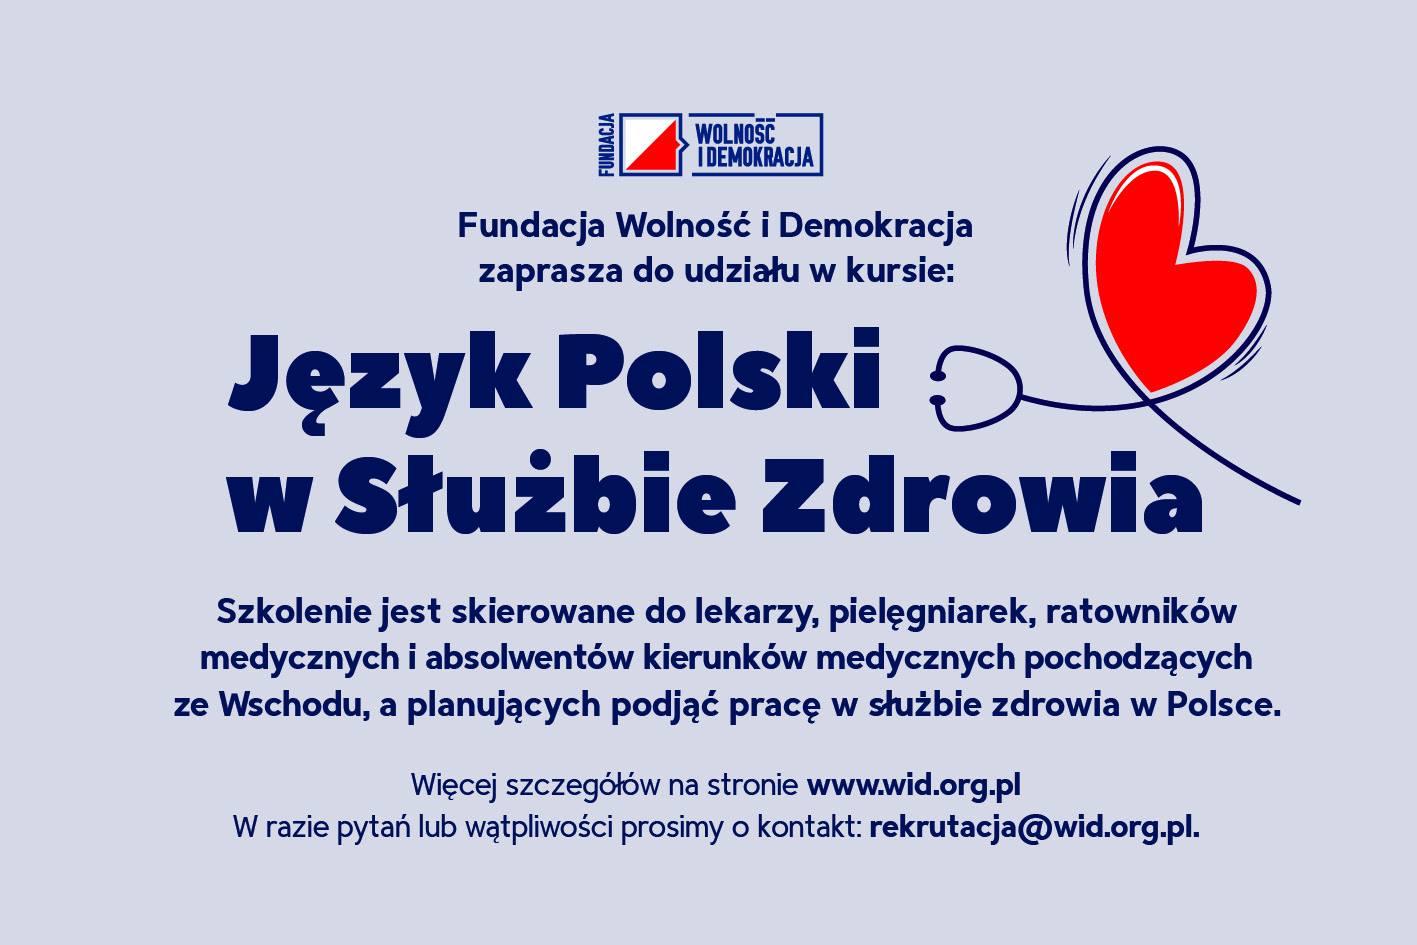 Фото: www.wid.org.pl